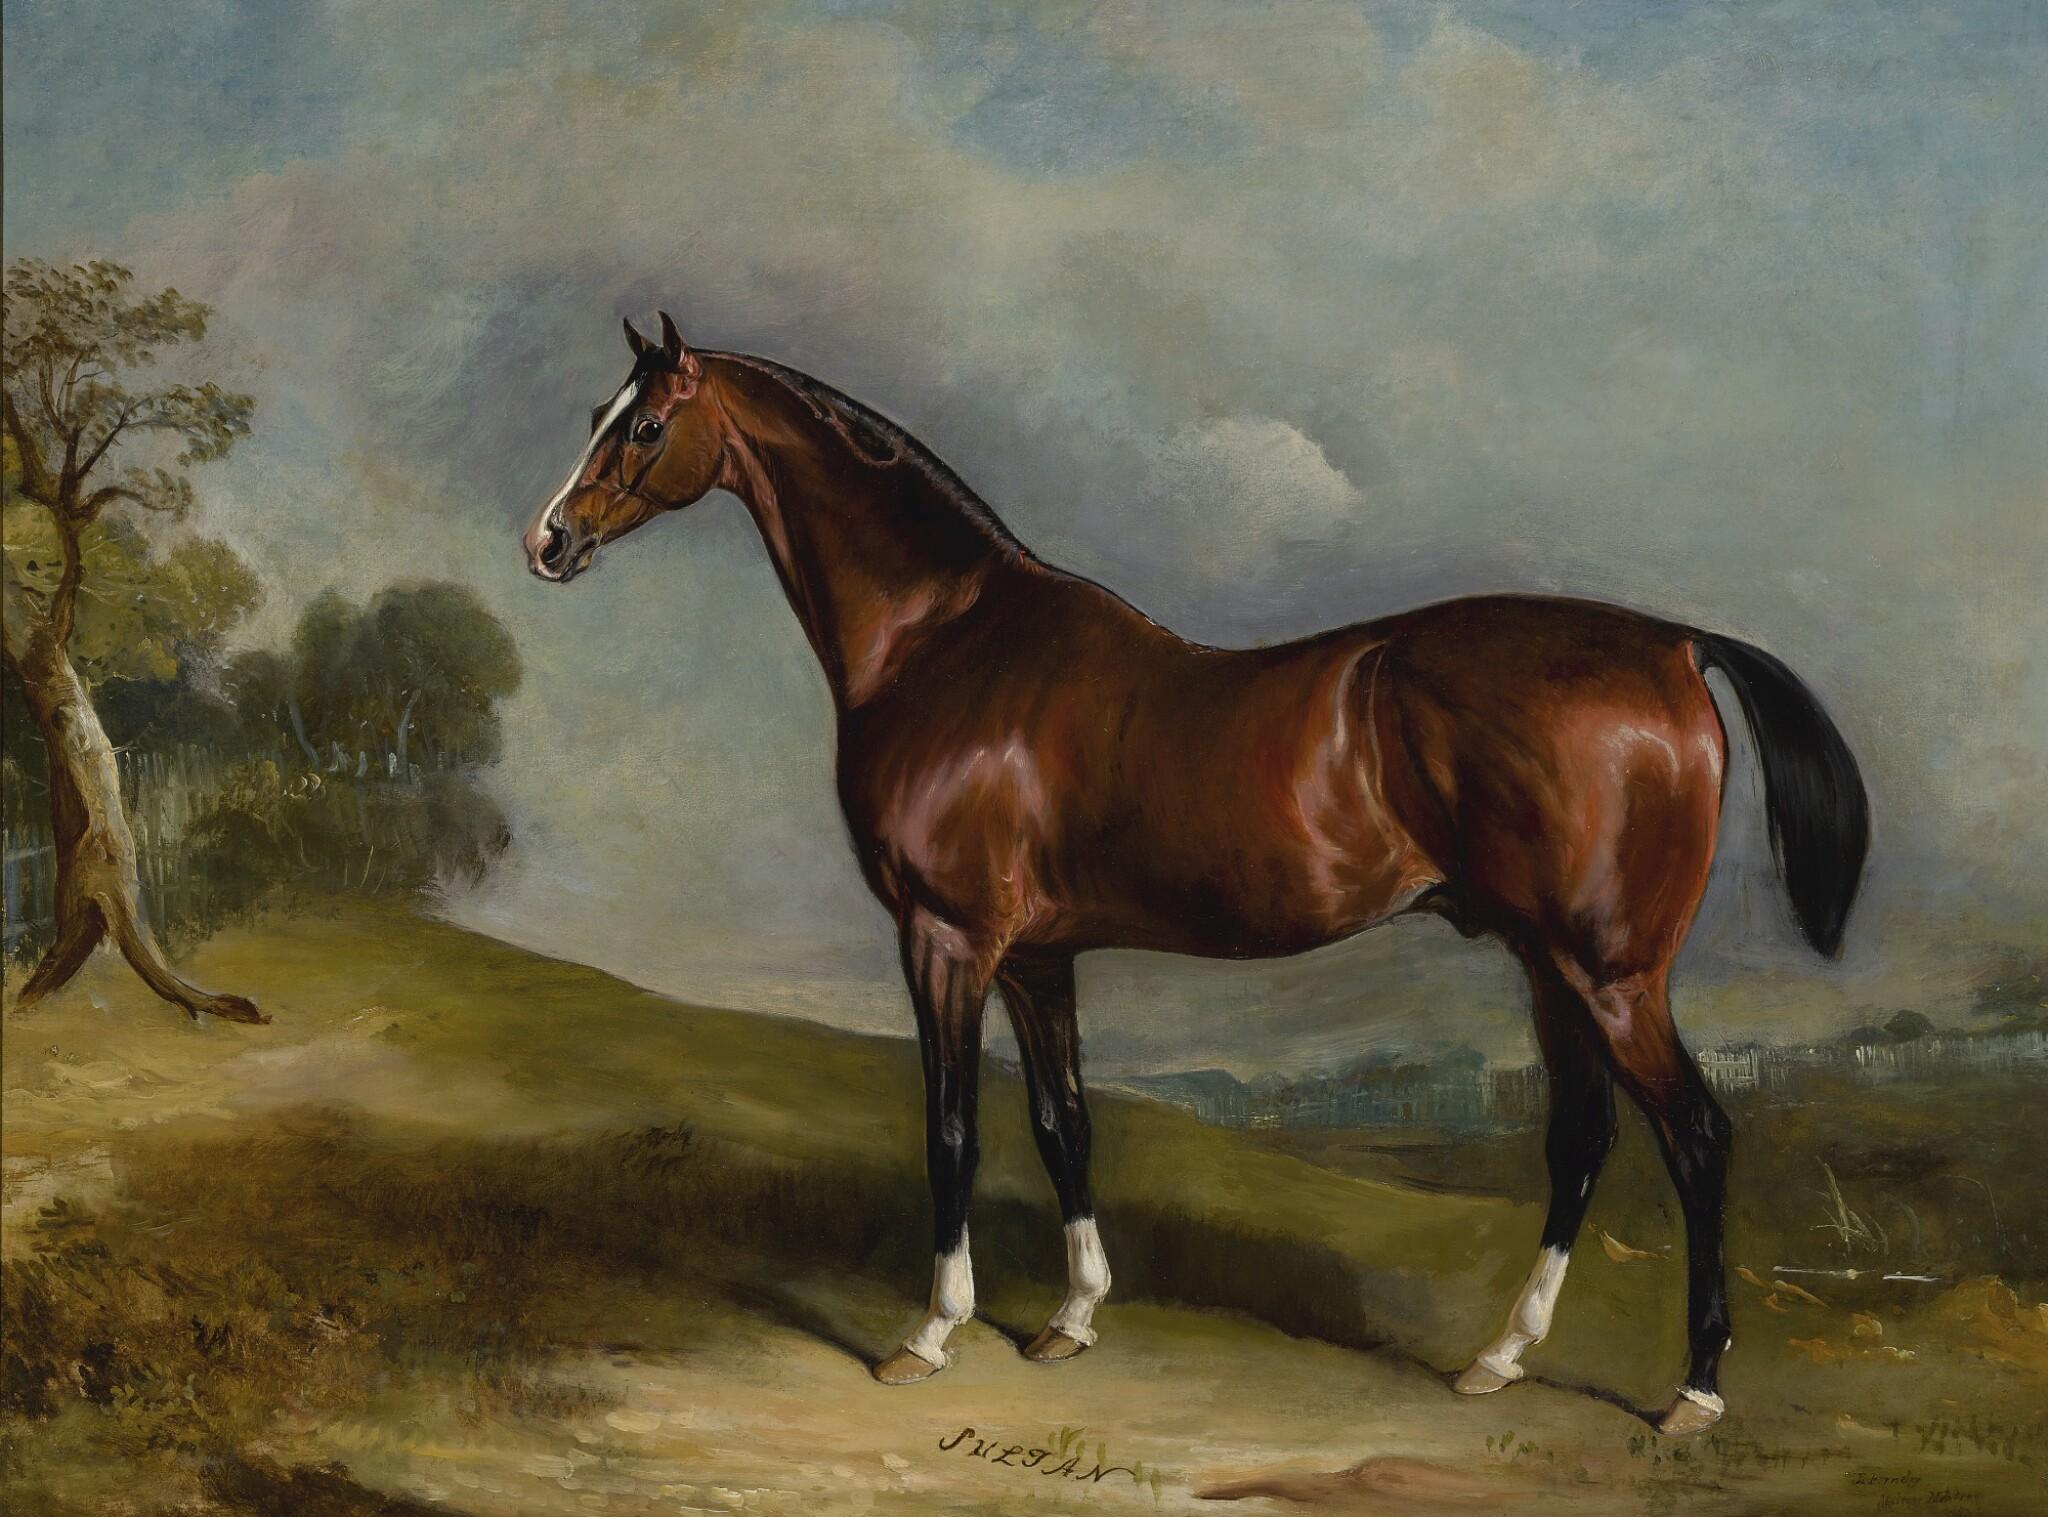 View full screen - View 1 of Lot 878. John Ferneley Snr. | PORTRAIT OF SULTAN, A RACEHORSE, IN A LANDSCAPE.